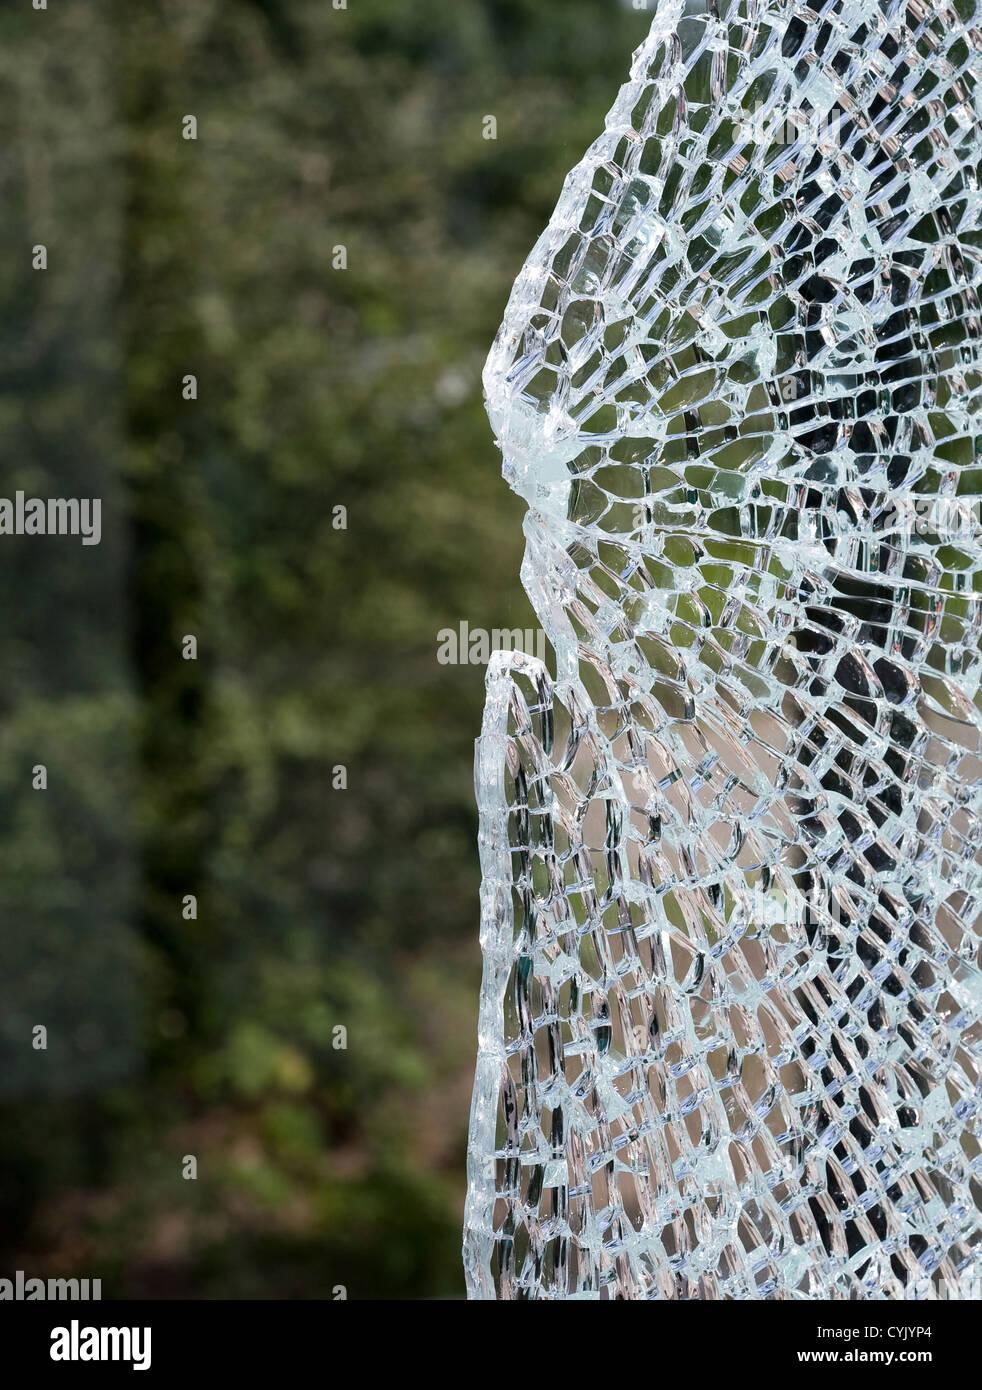 A broken window at a busstop caused bij vandalism - Stock Image